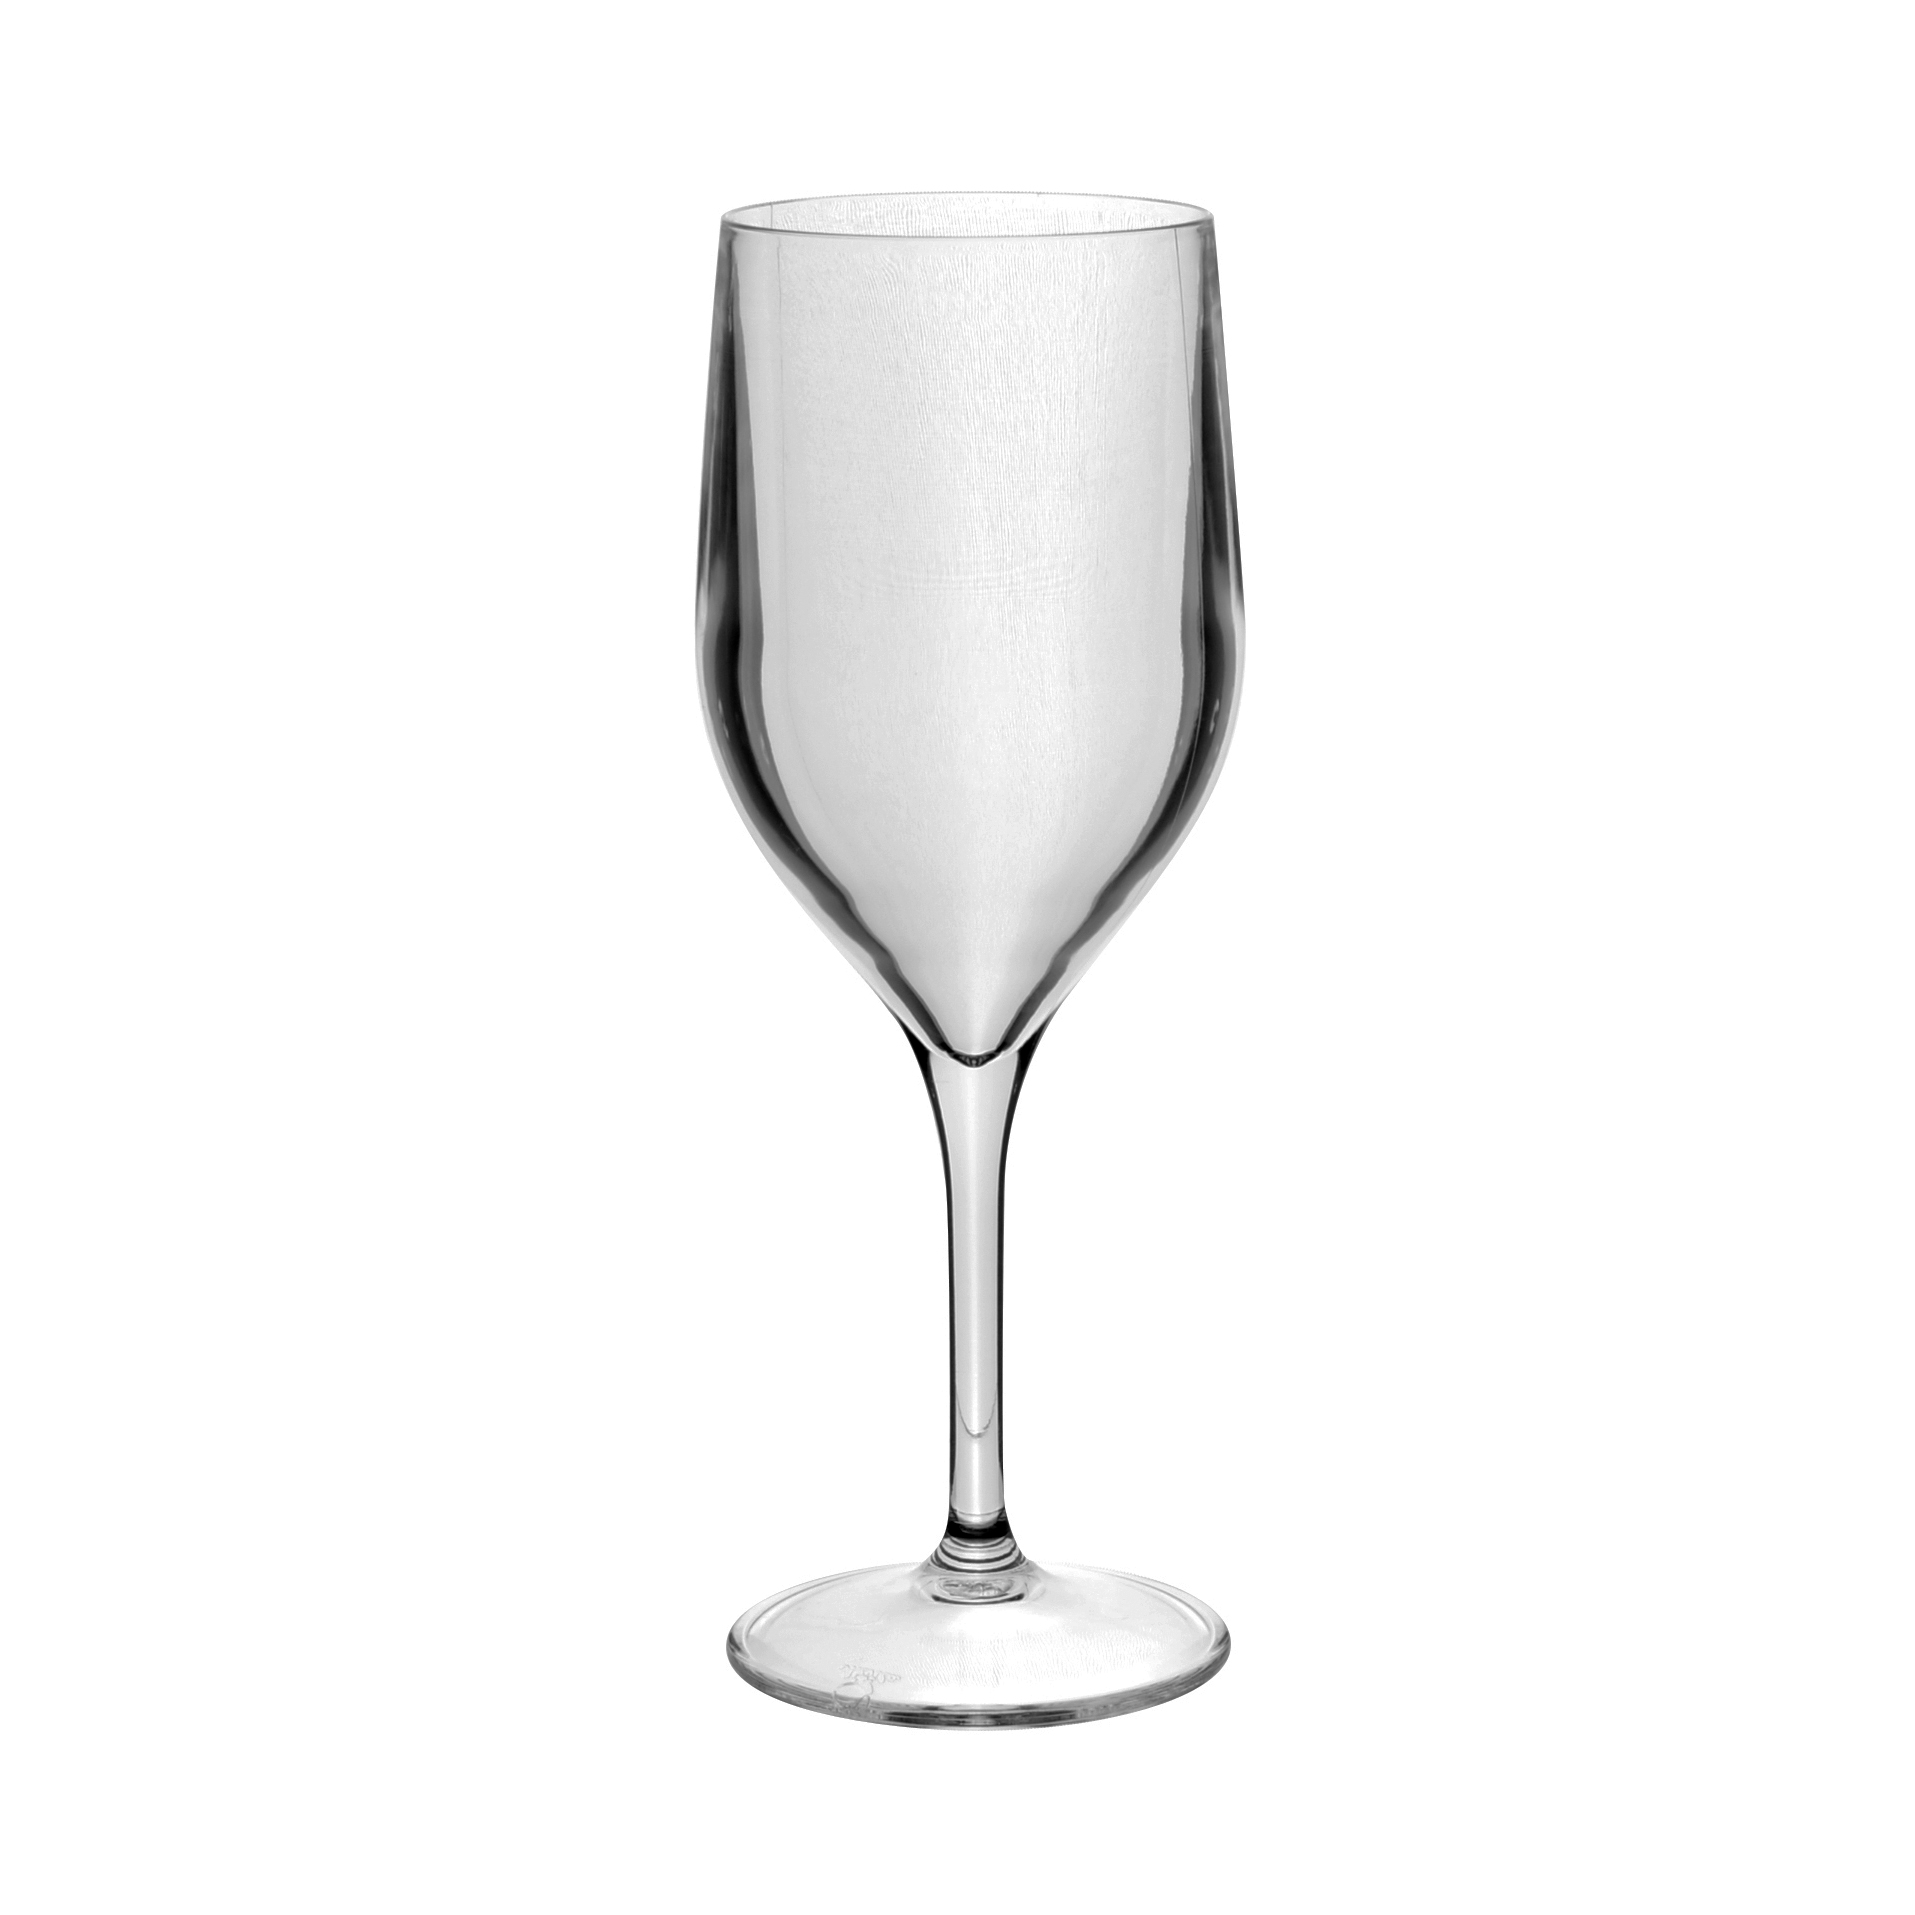 3d4e2b7b56c Premium Polycarbonate Wine Glass Set – 6 TAO Wine Glasses